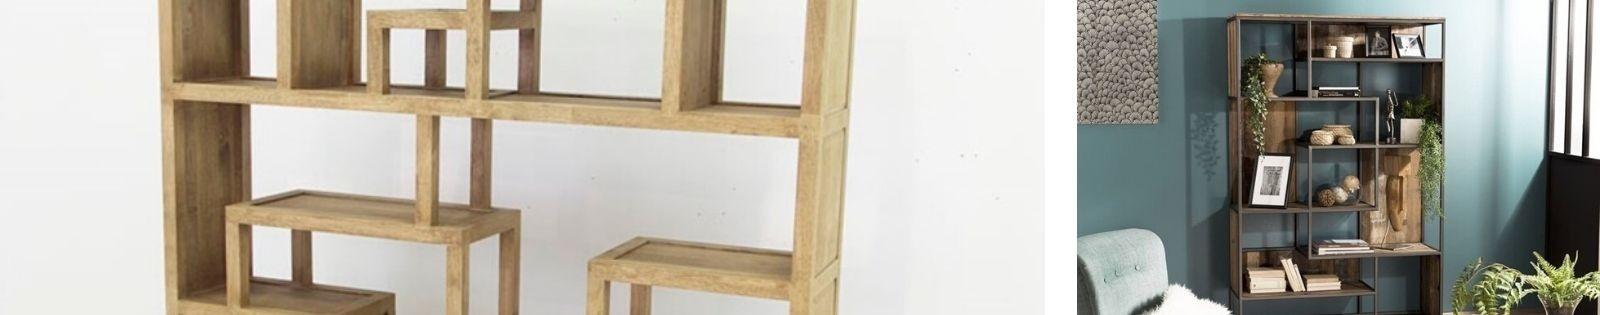 Bibliothèque en bois massif : acacia, chêne, hévéa, teck... Lotuséa